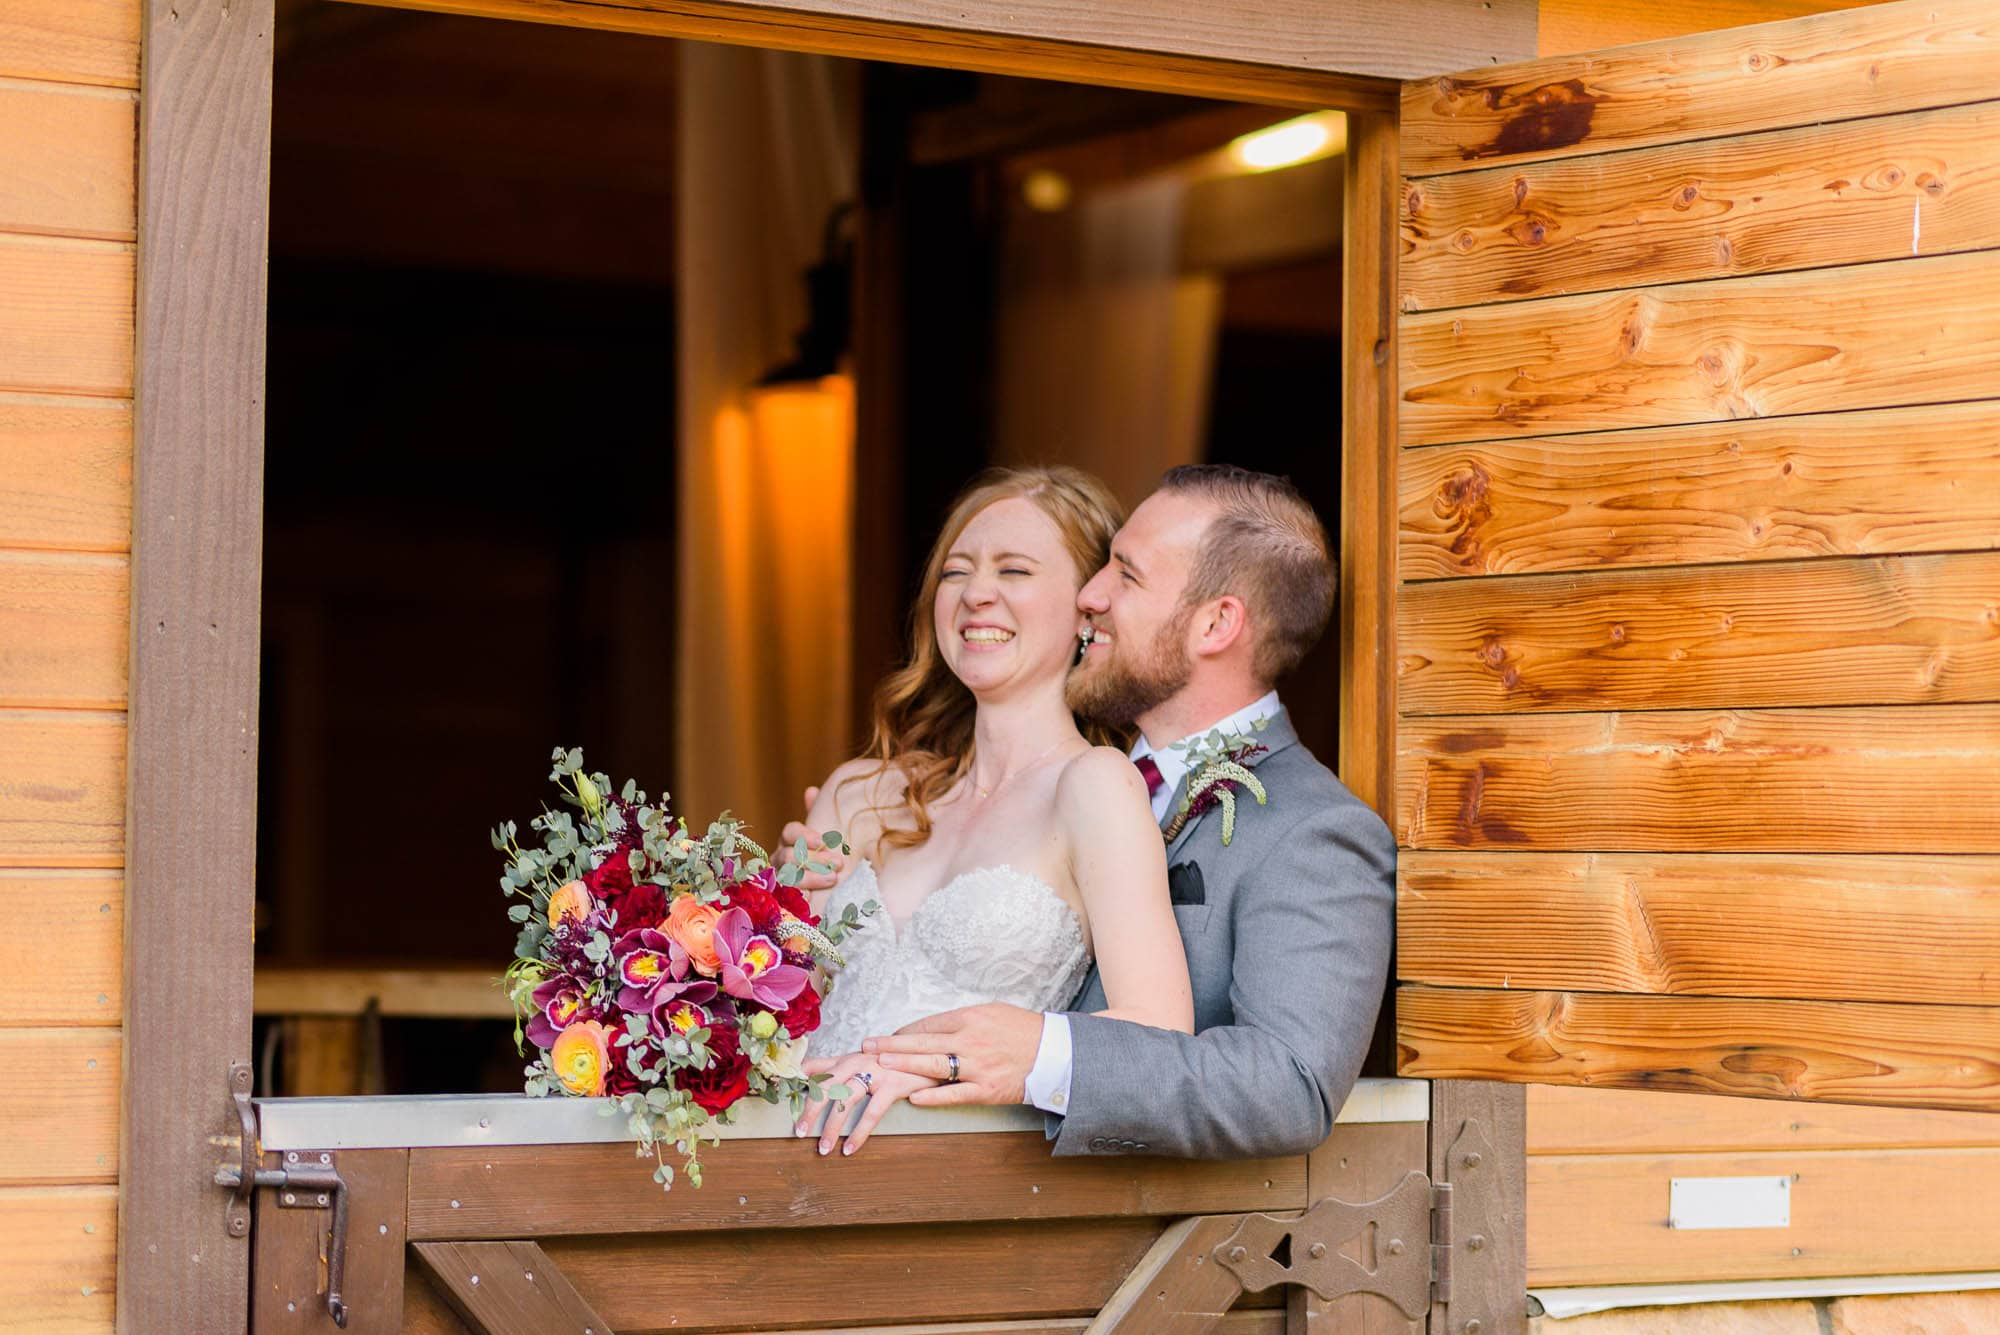 404_Alan_and_Heidi_Serendipity_Garden_Wedding_10-27-2018